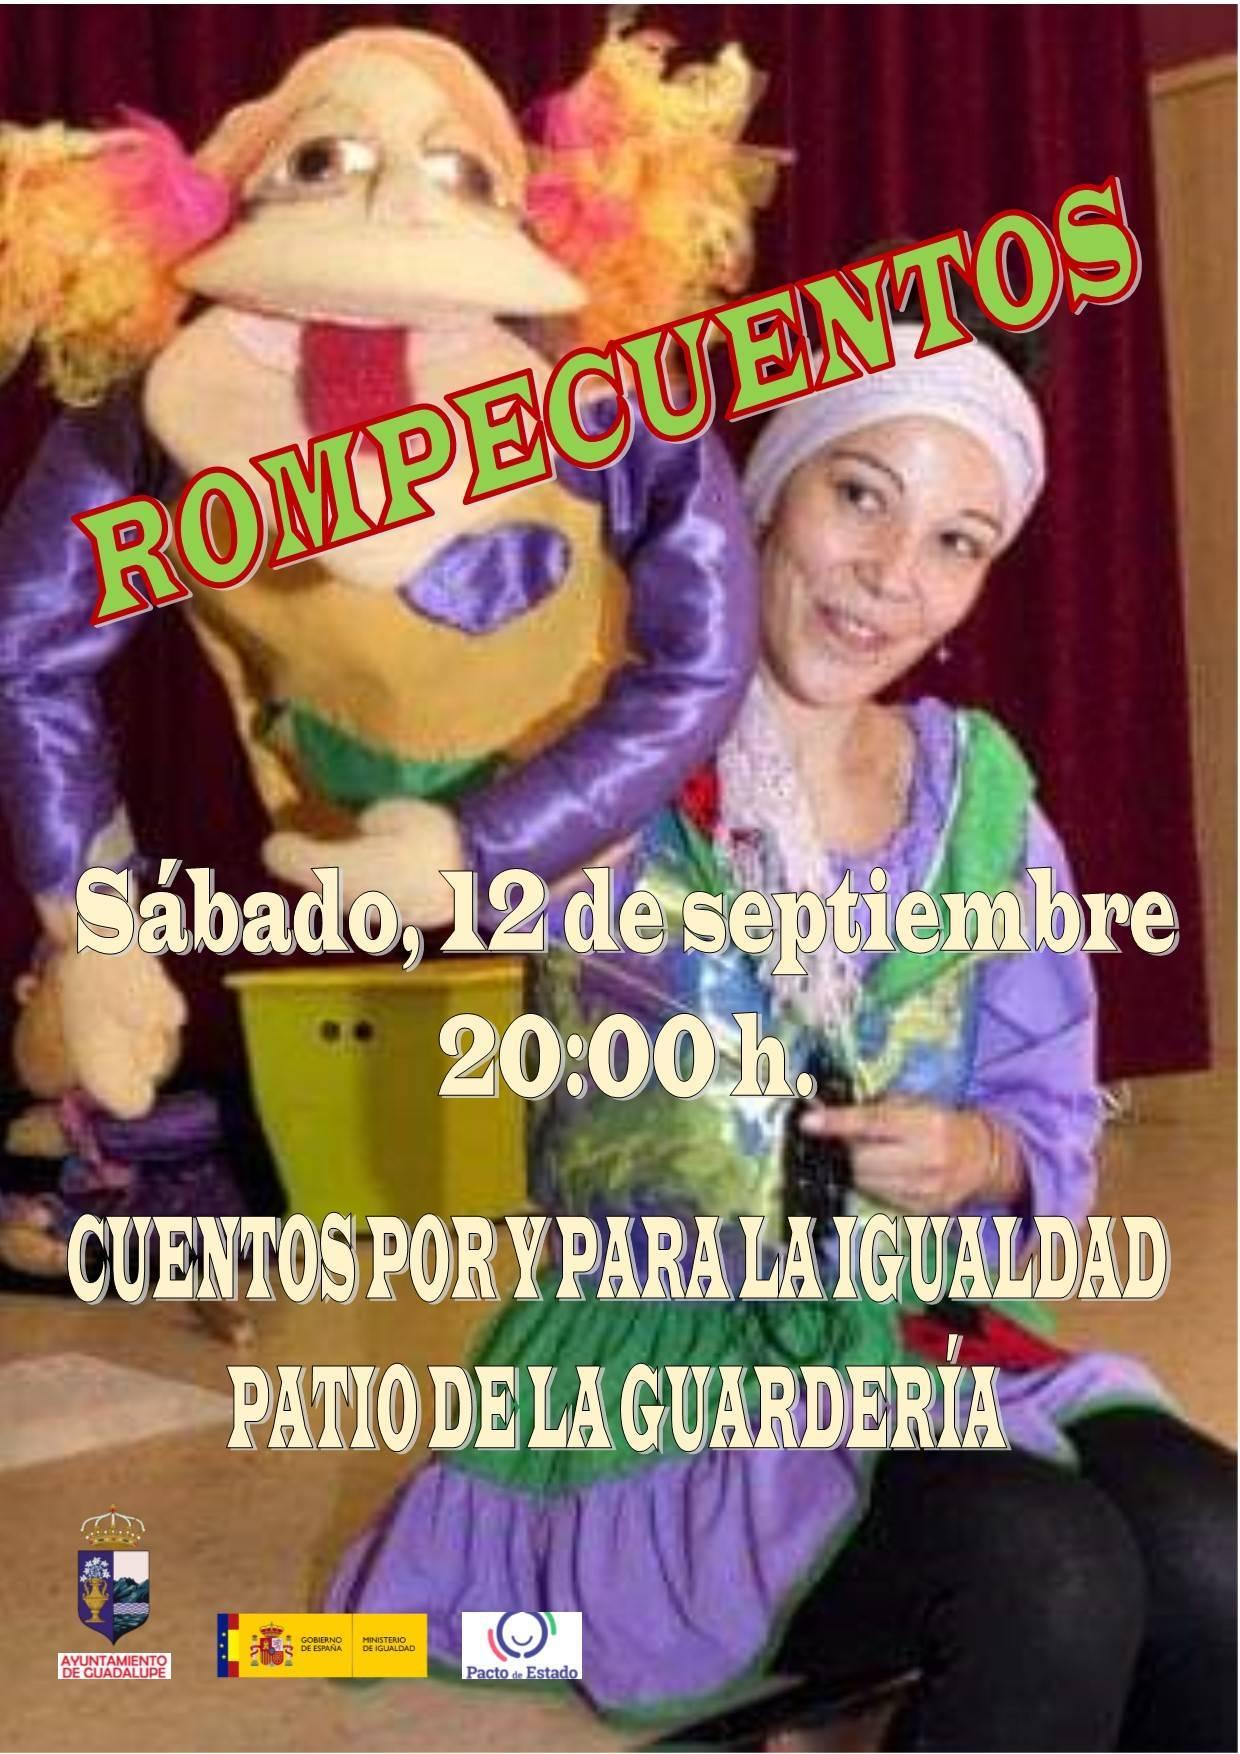 Rompecuentos (2020) - Guadalupe (Cáceres)